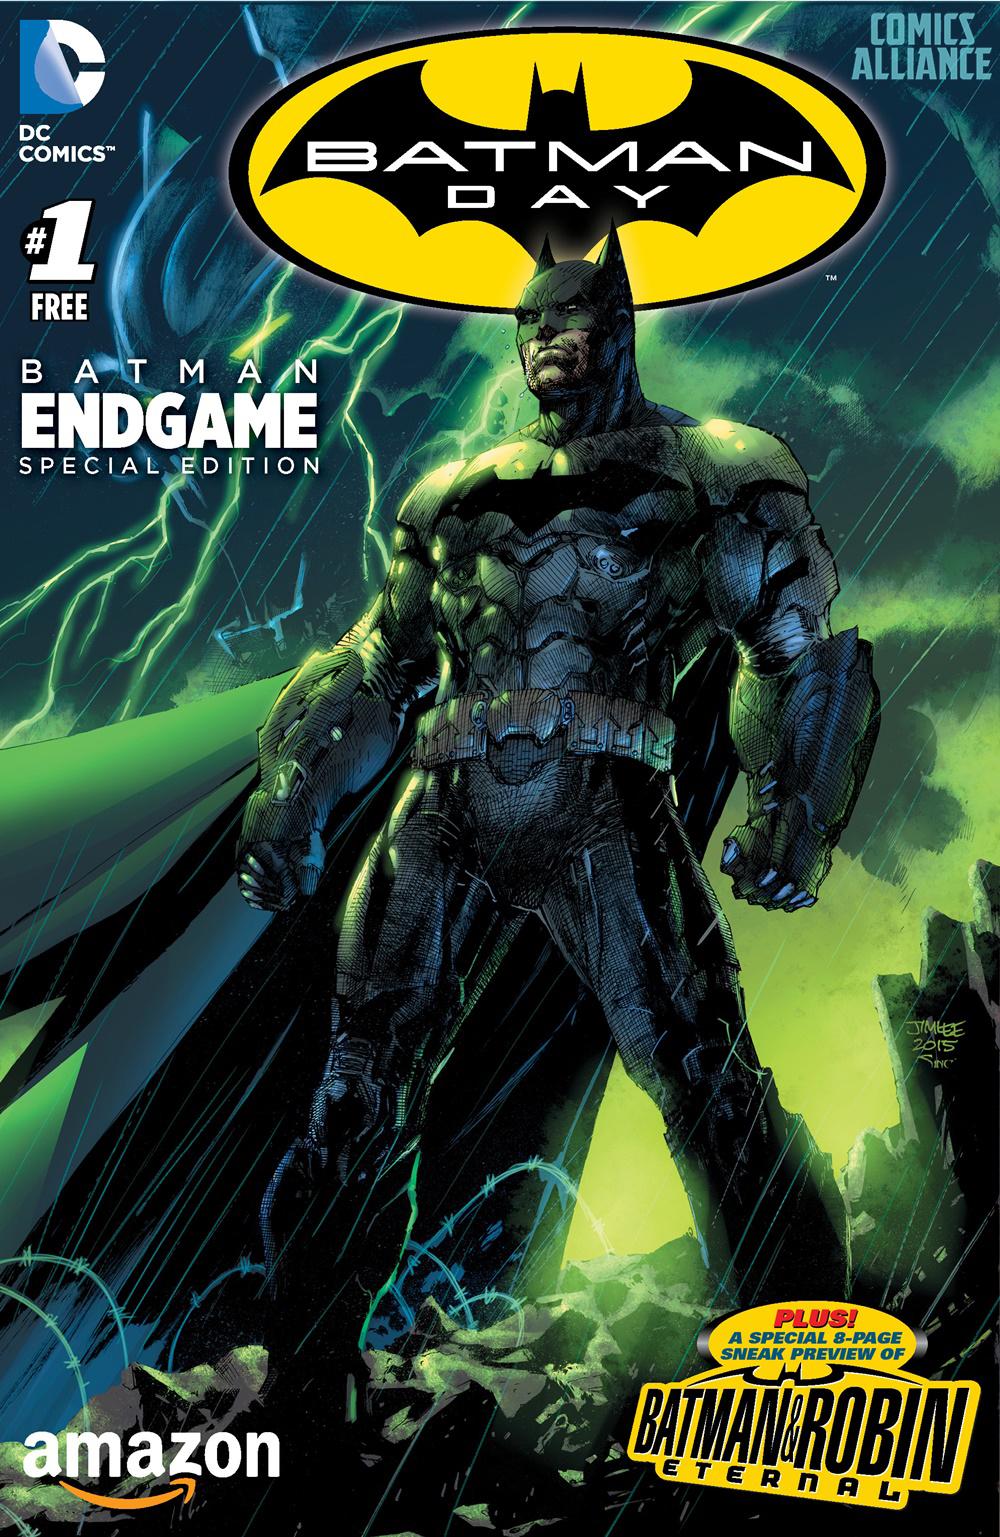 BatmanDay_Amazon